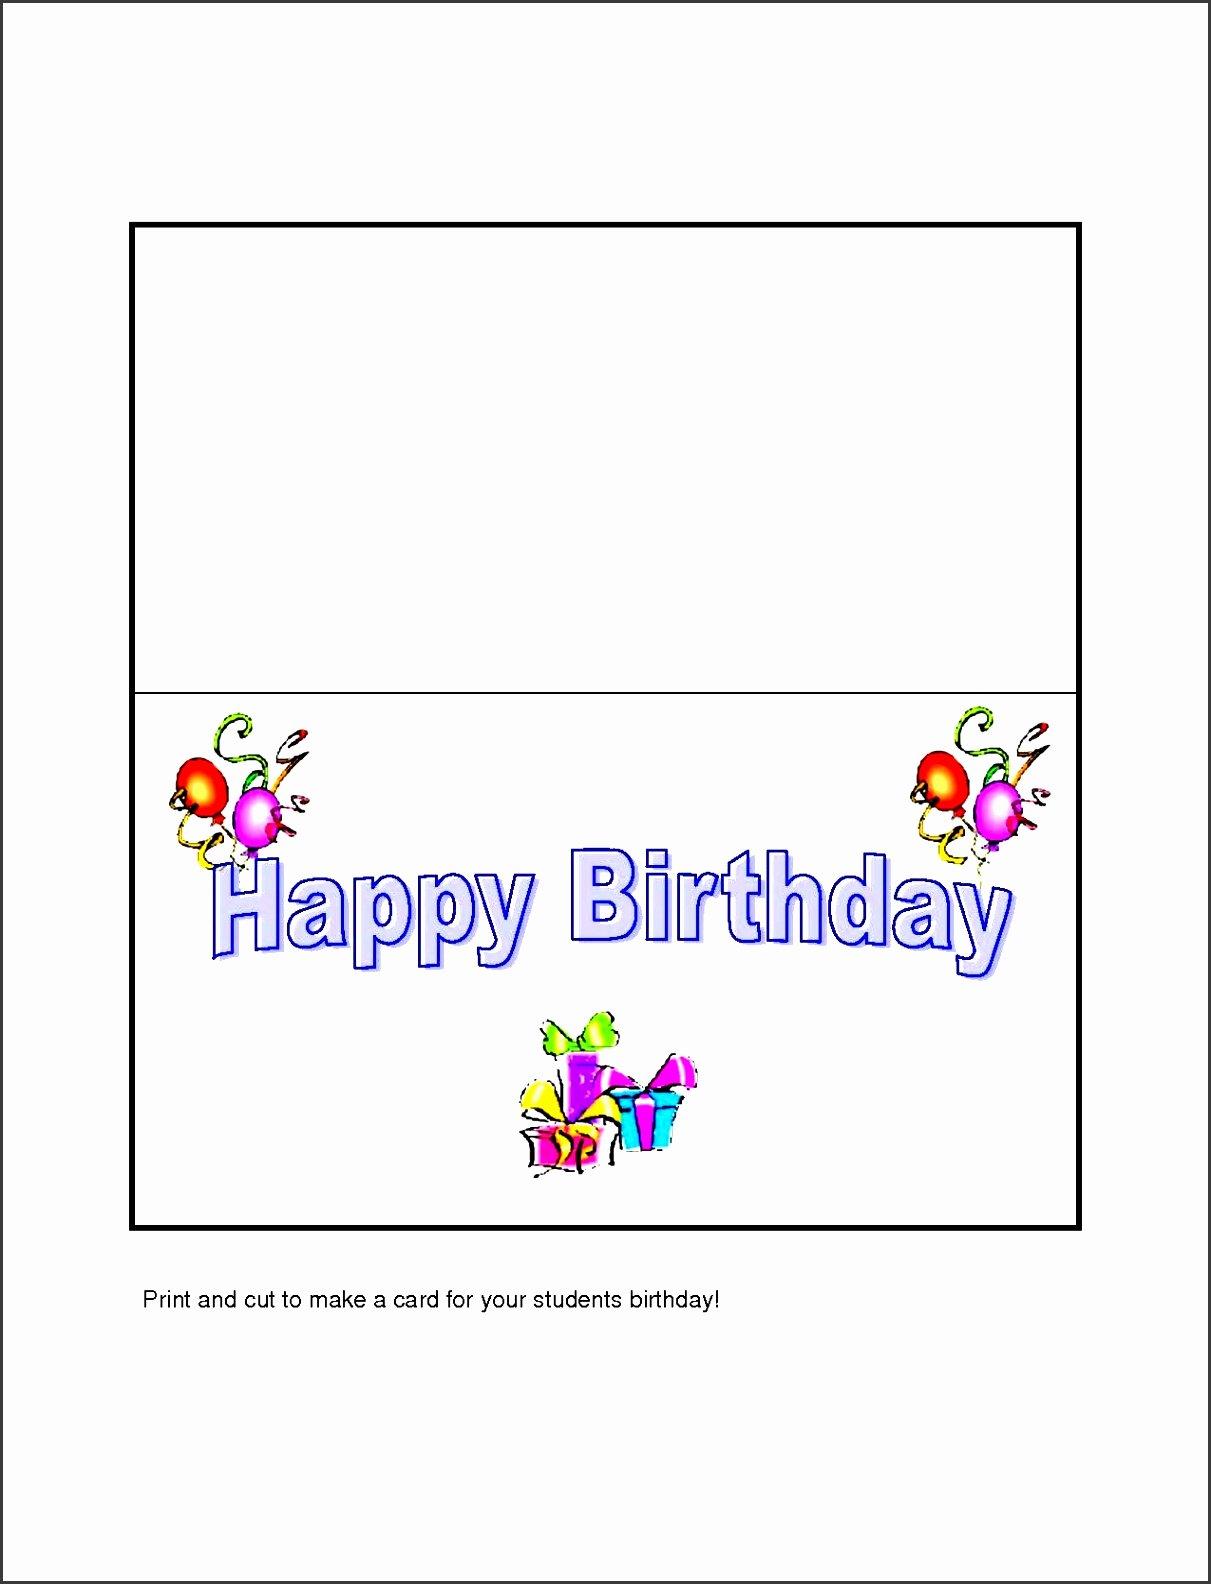 10 Free Microsoft Word Greeting Card Templates